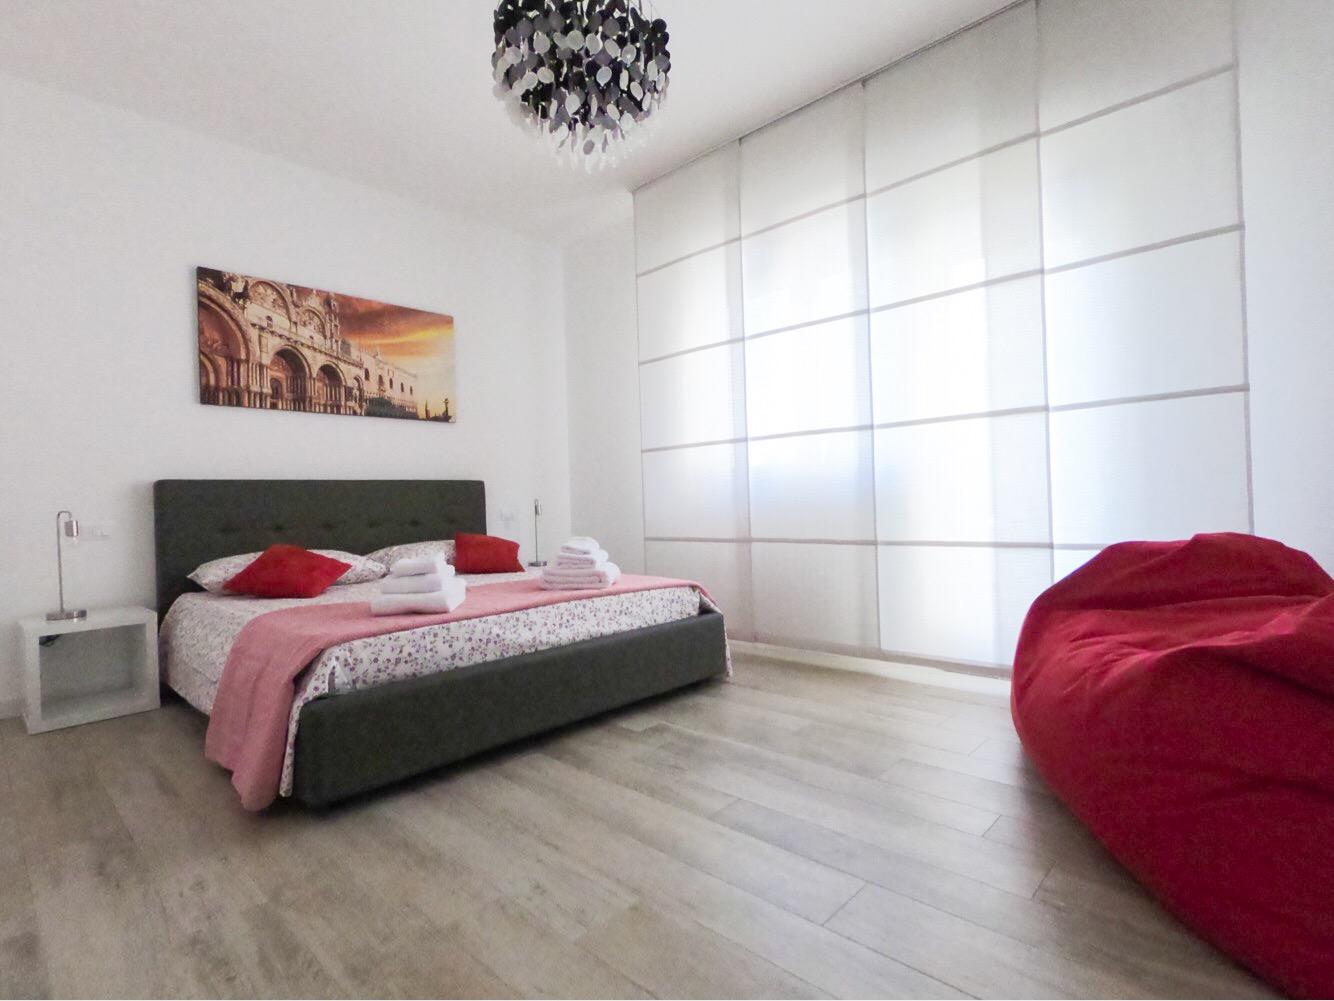 Negozi Biancheria Casa Mestre doge's home - confortevole e moderno appartamento - houses